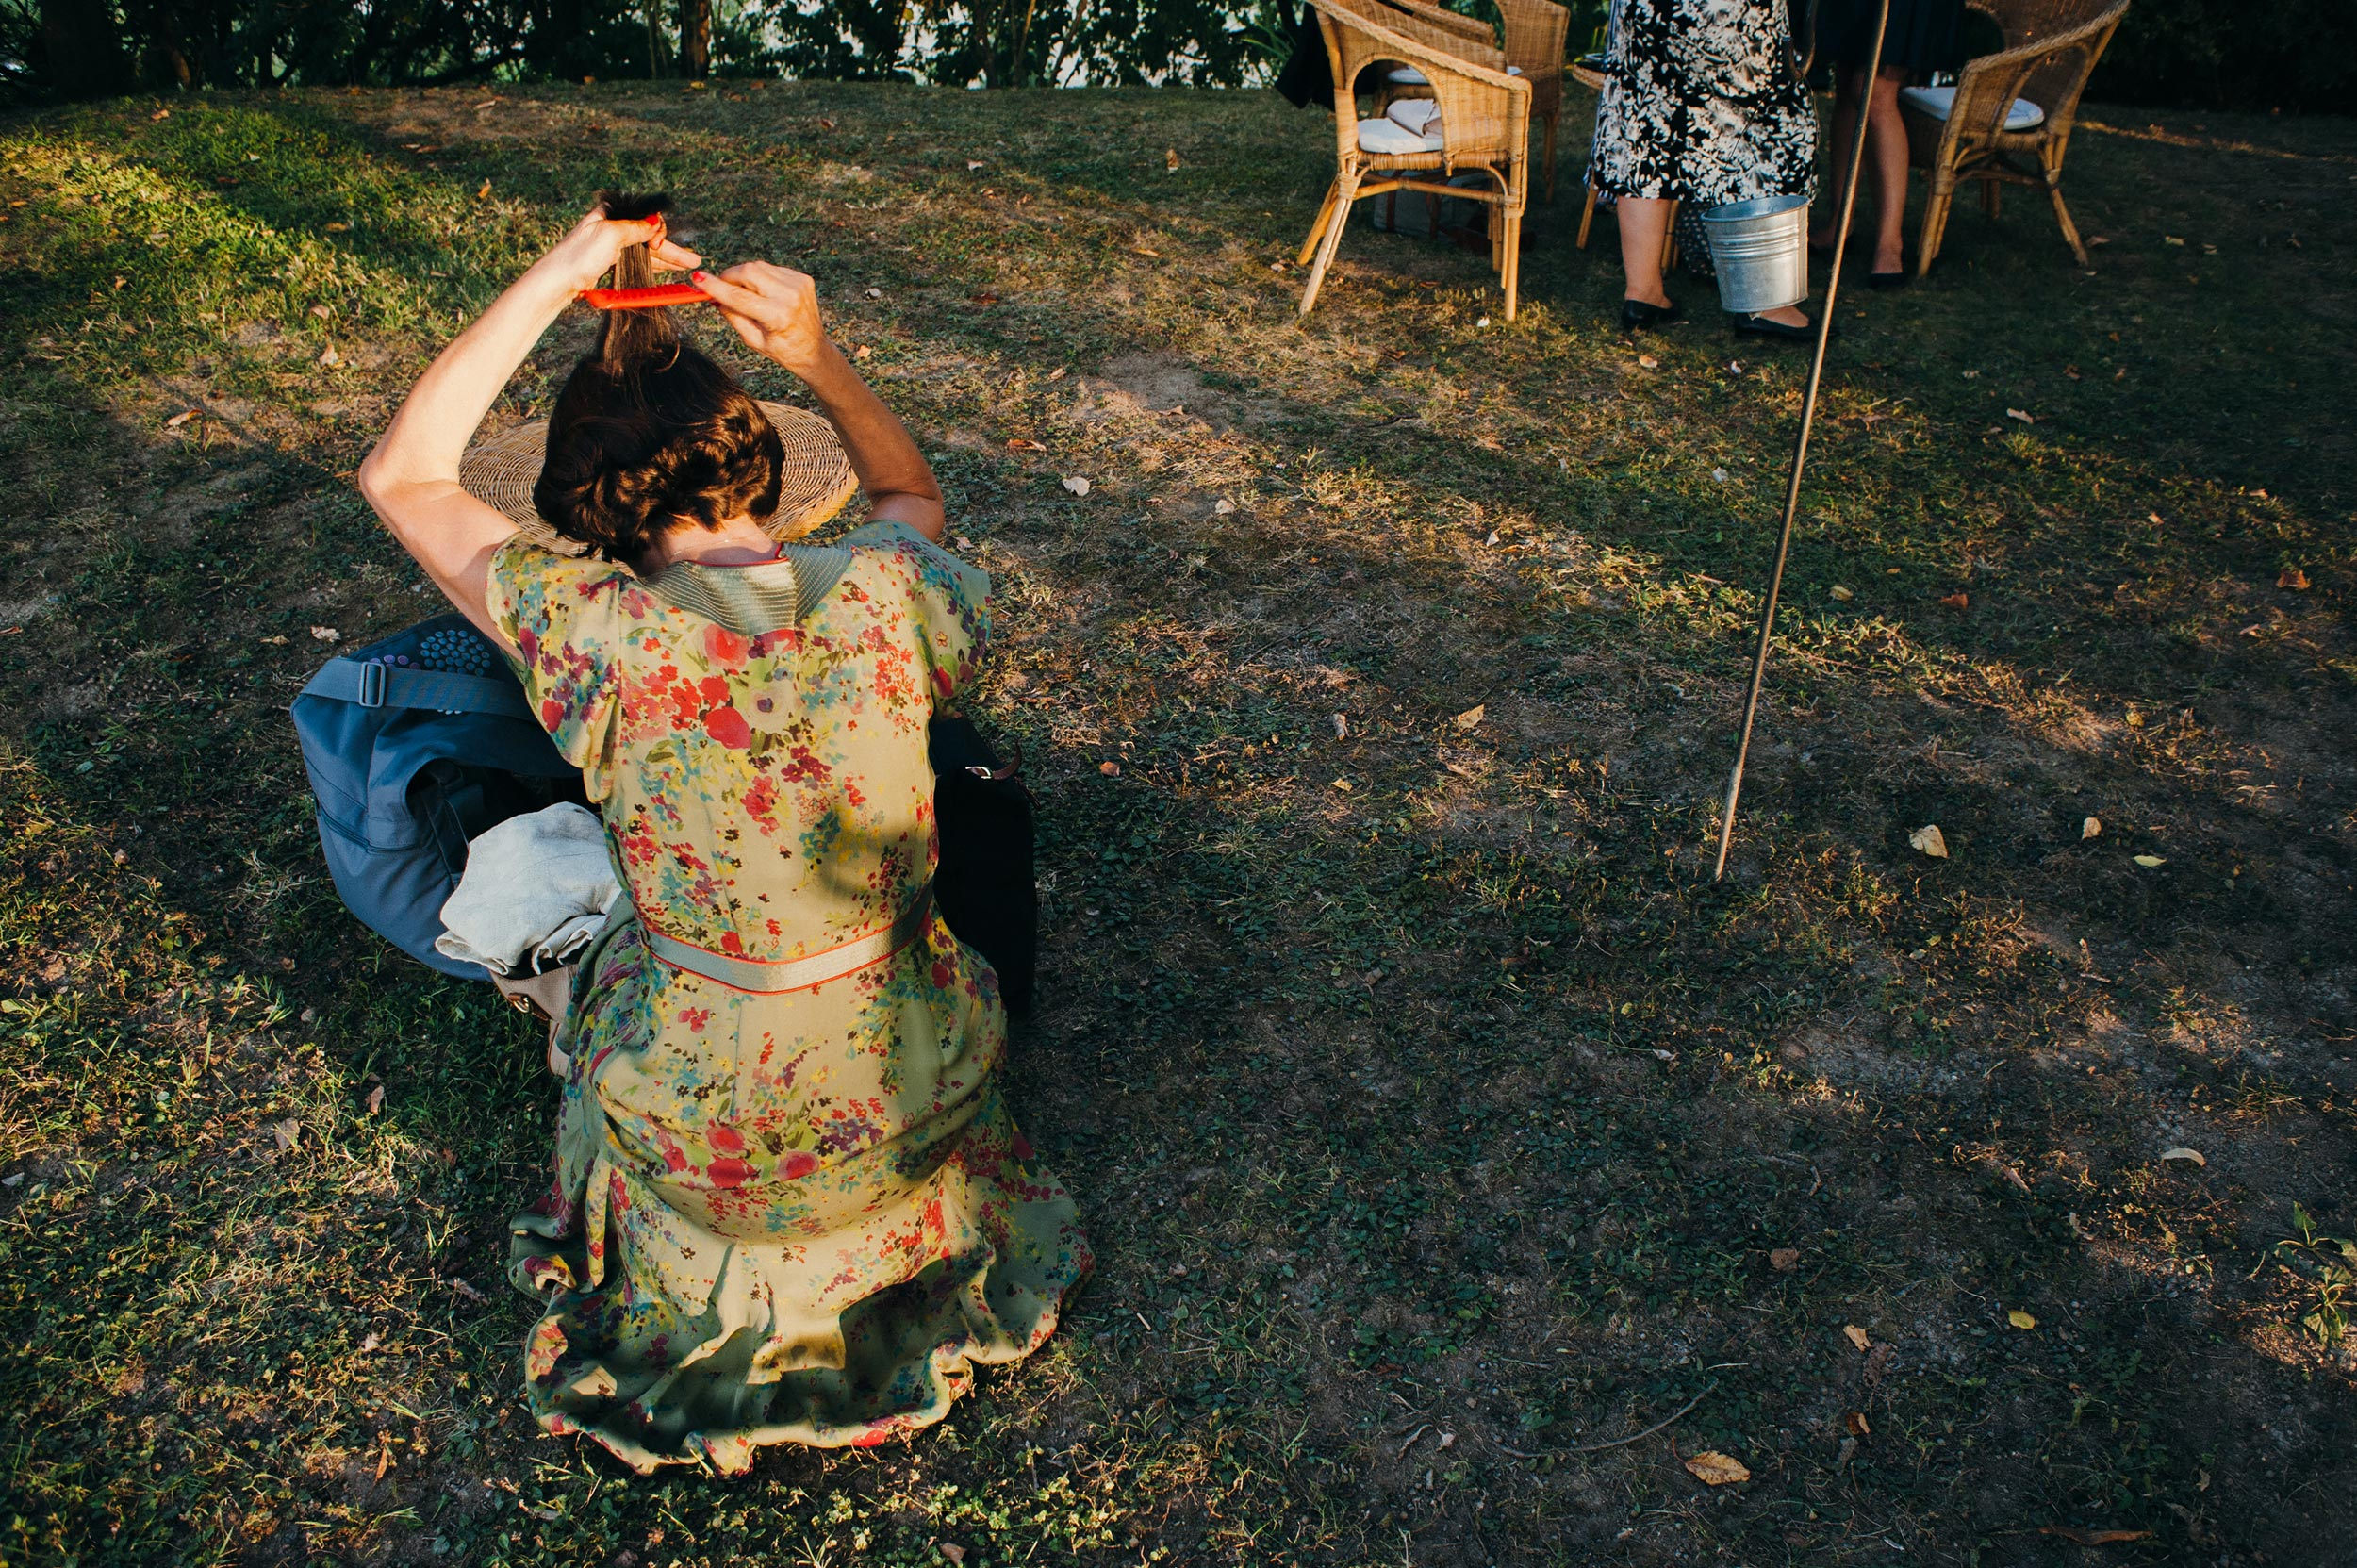 2016-Davor-Chiara-Monferrato-Asti-Vercelli-Wedding-Photographer-Italy-Alessandro-Avenali-54.jpg